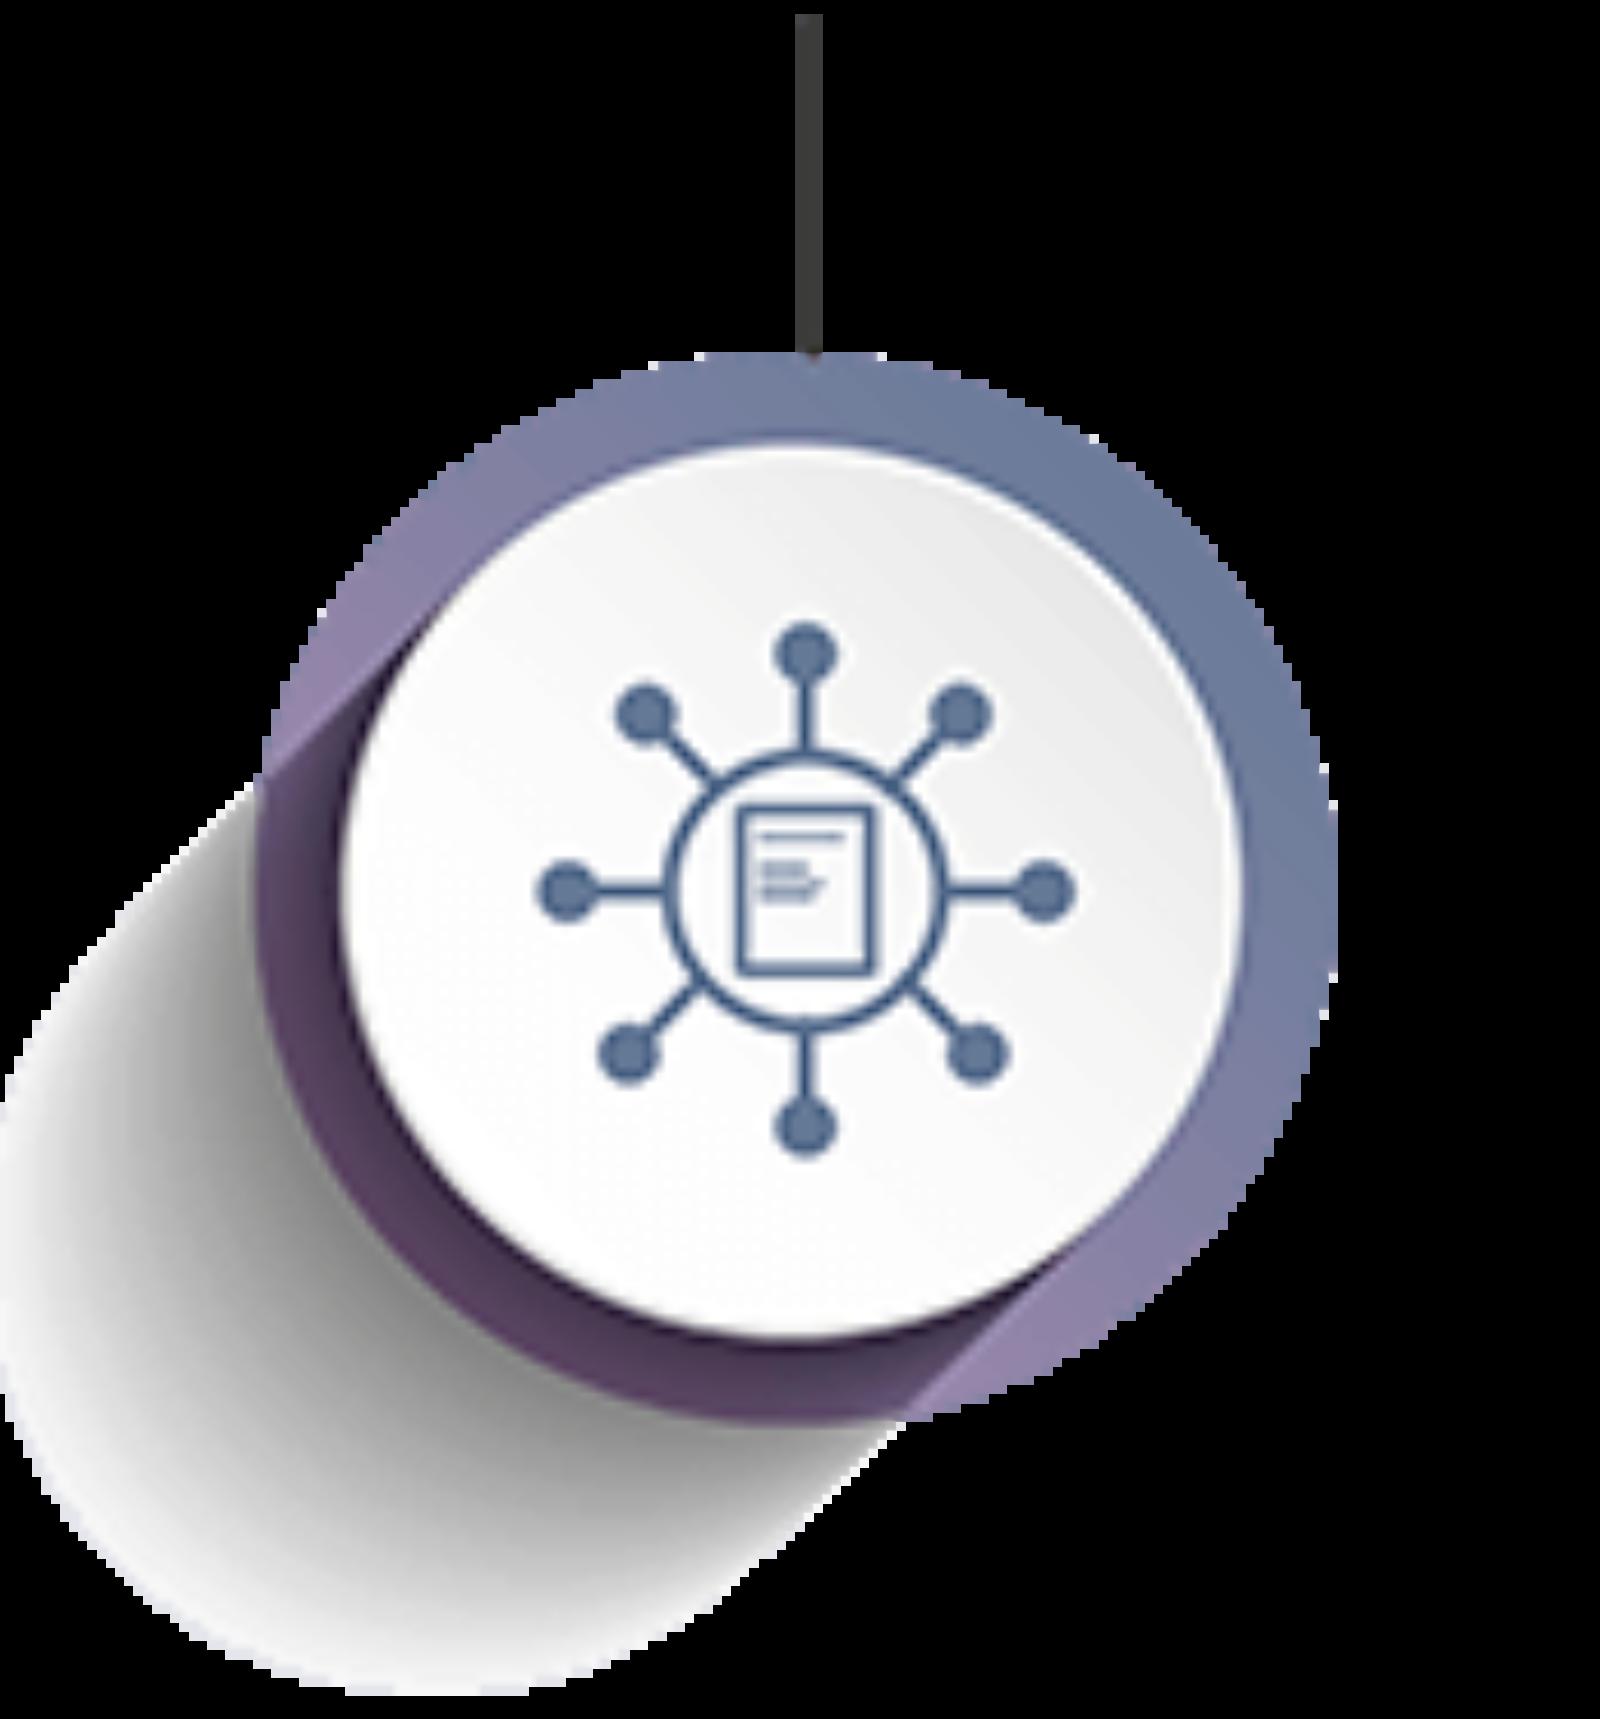 Icon Datenbank